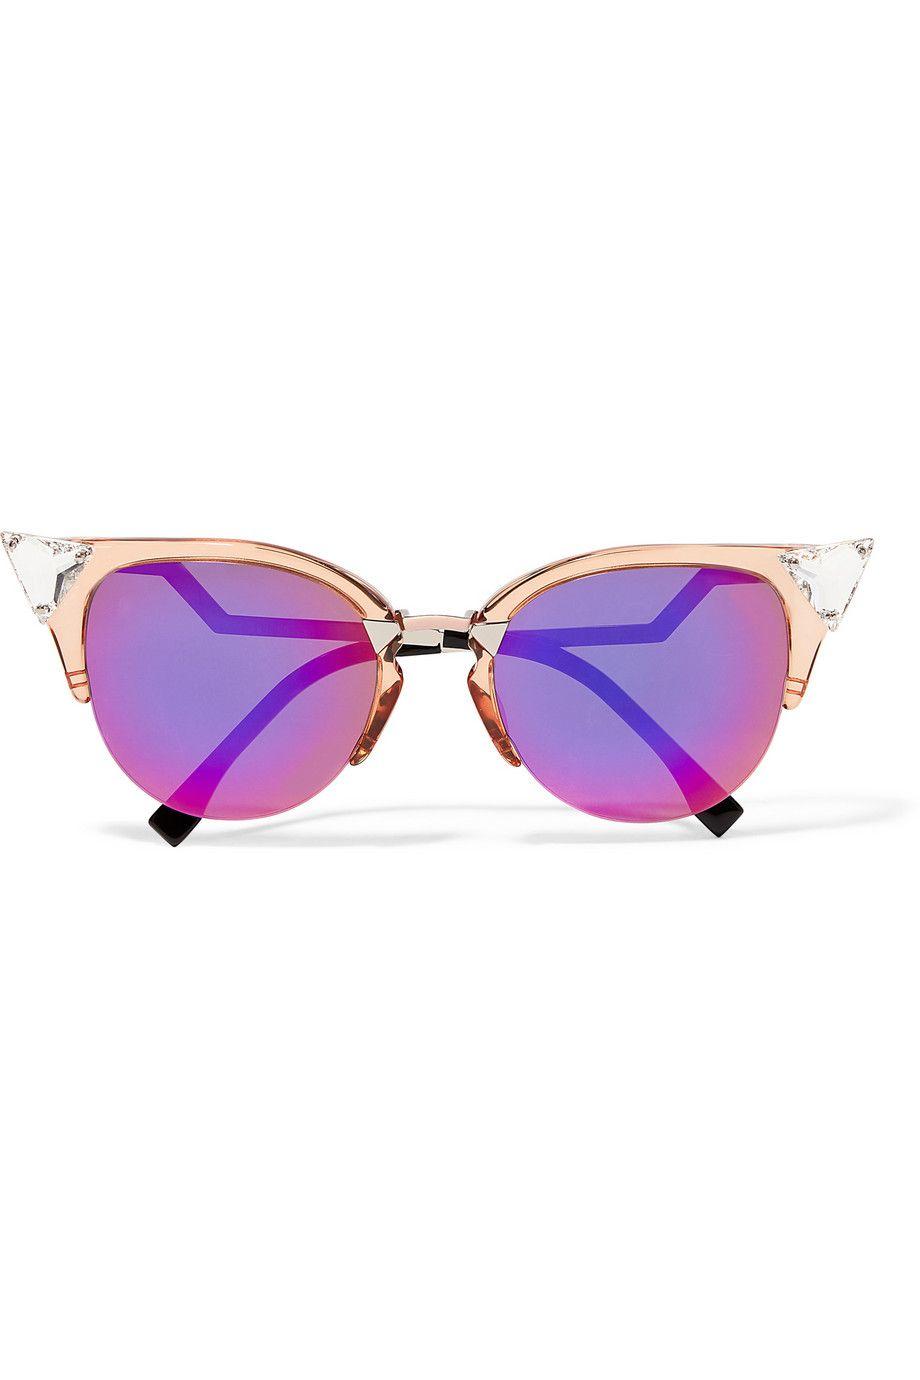 874ed3881a FENDI Swarovski crystal-embellished cat-eye acetate and metal sunglasses